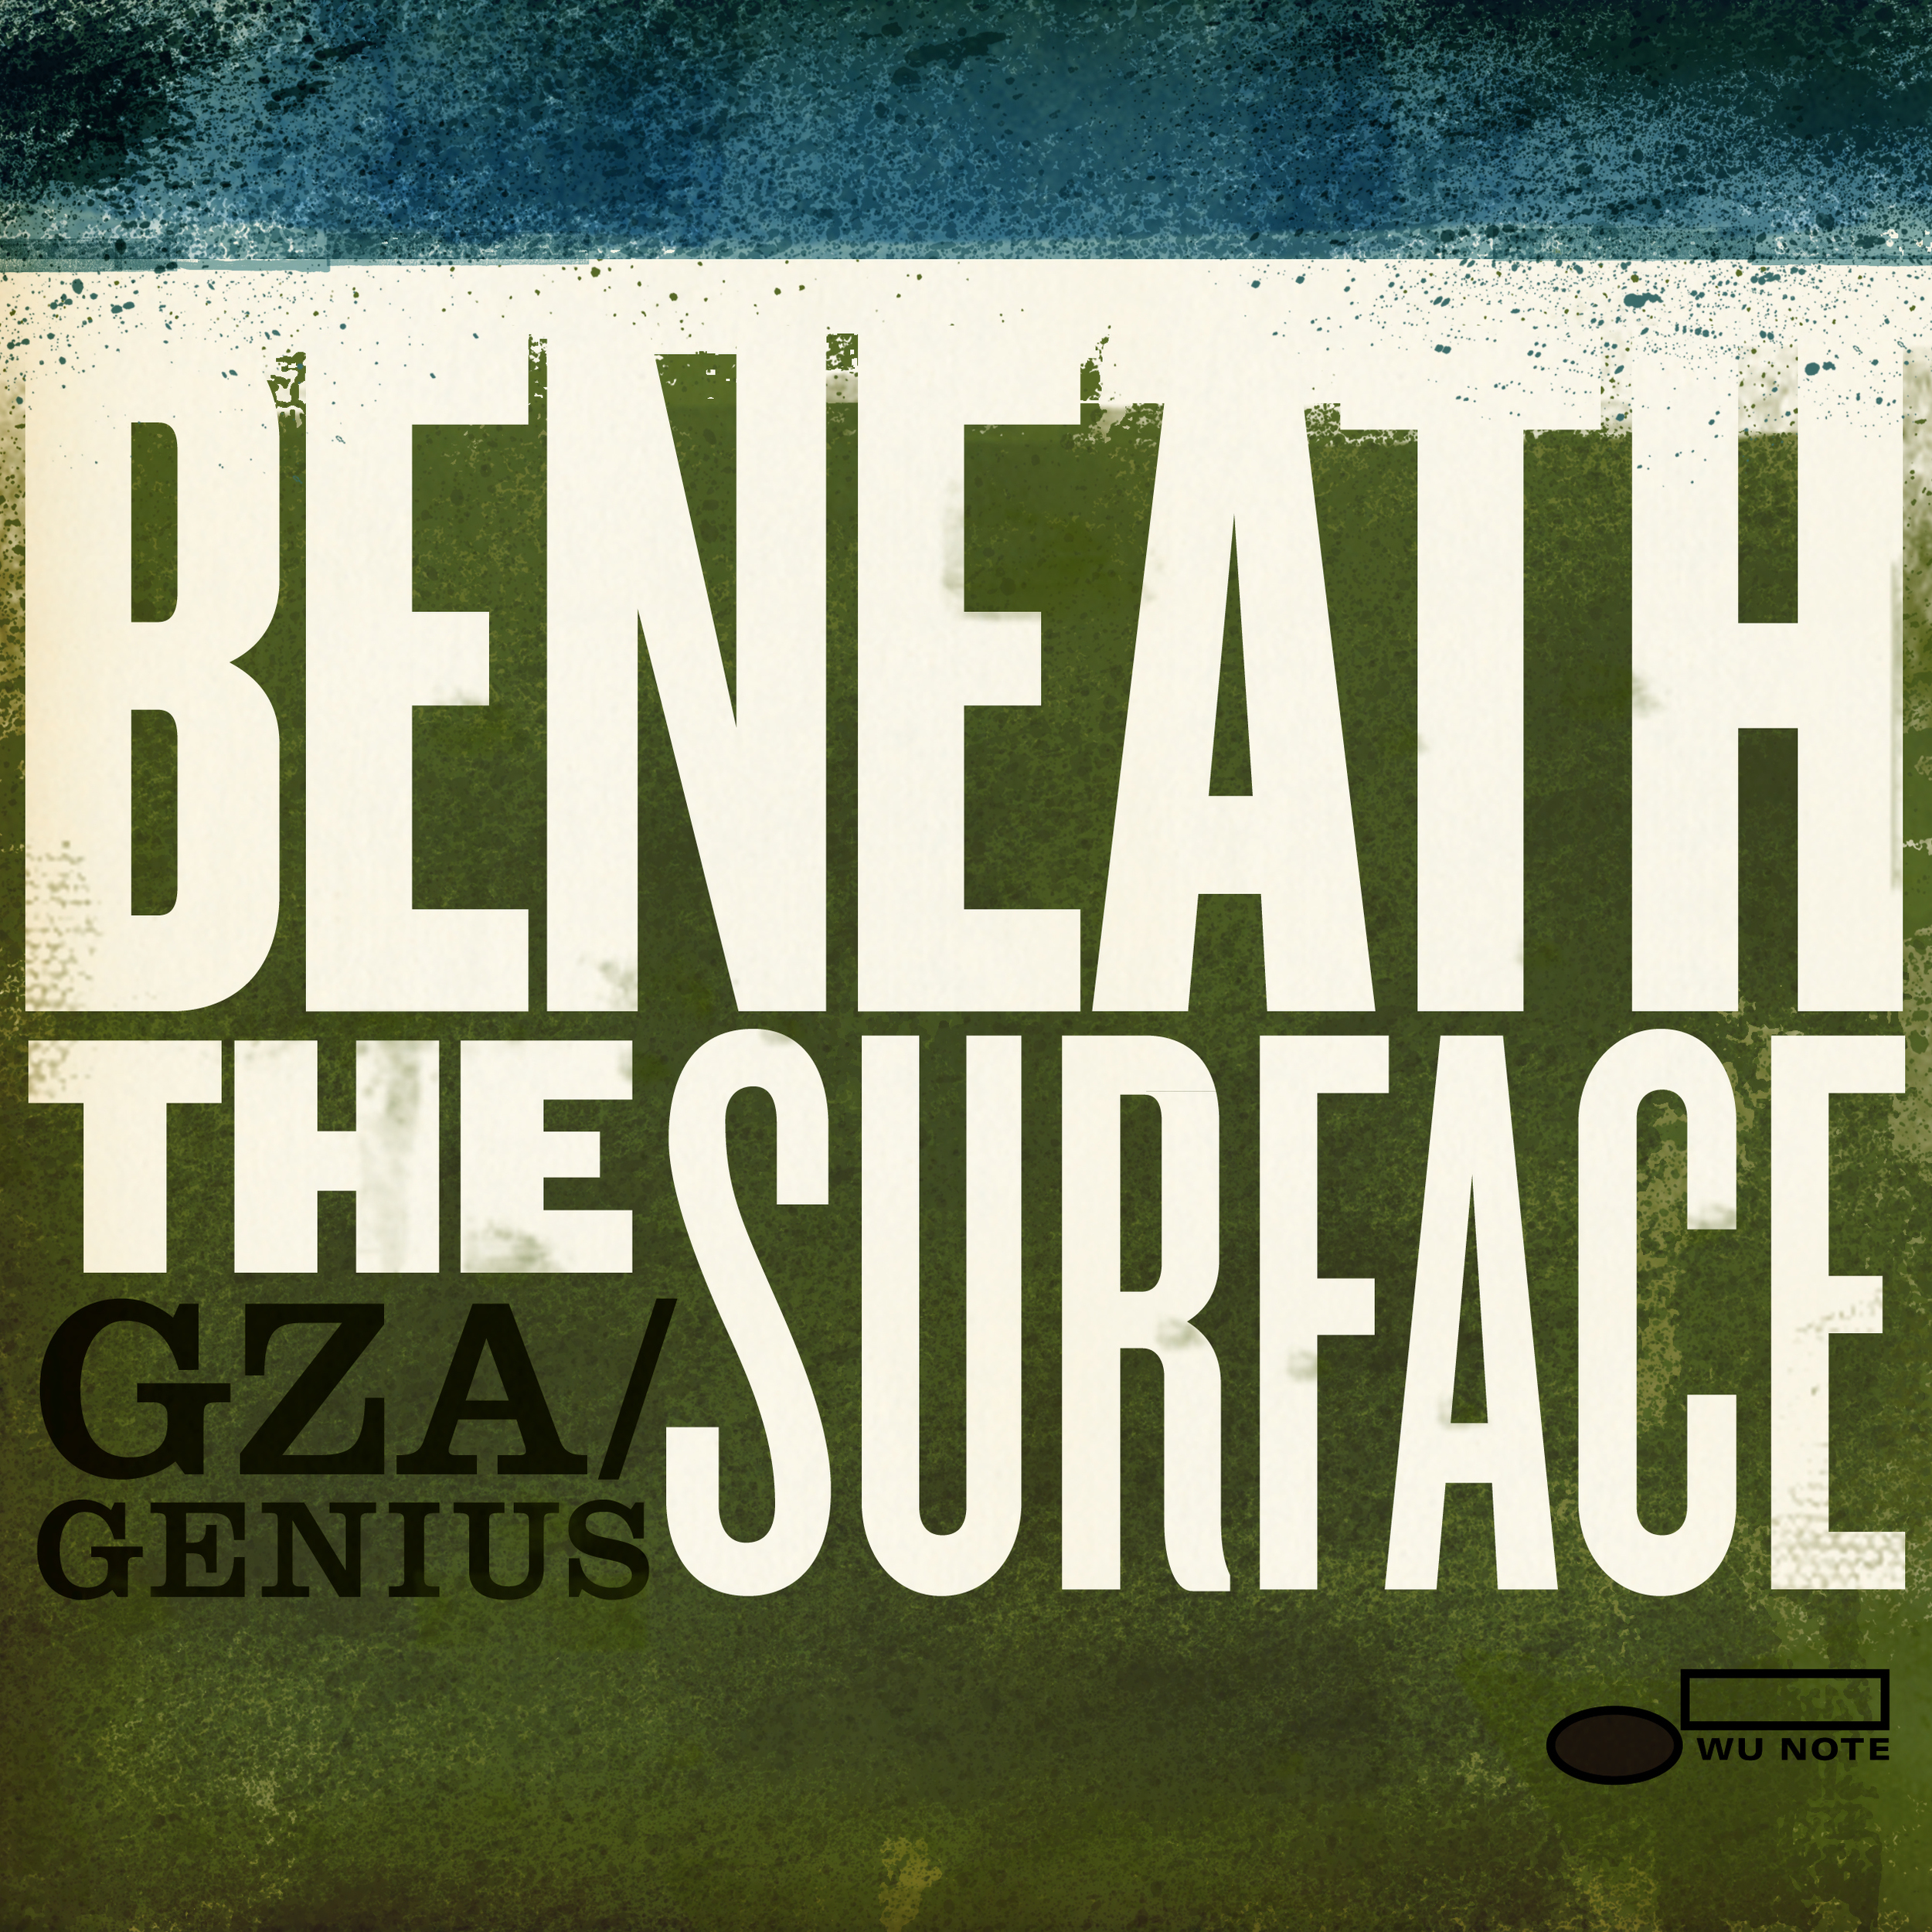 WuNote-Beneath.jpg